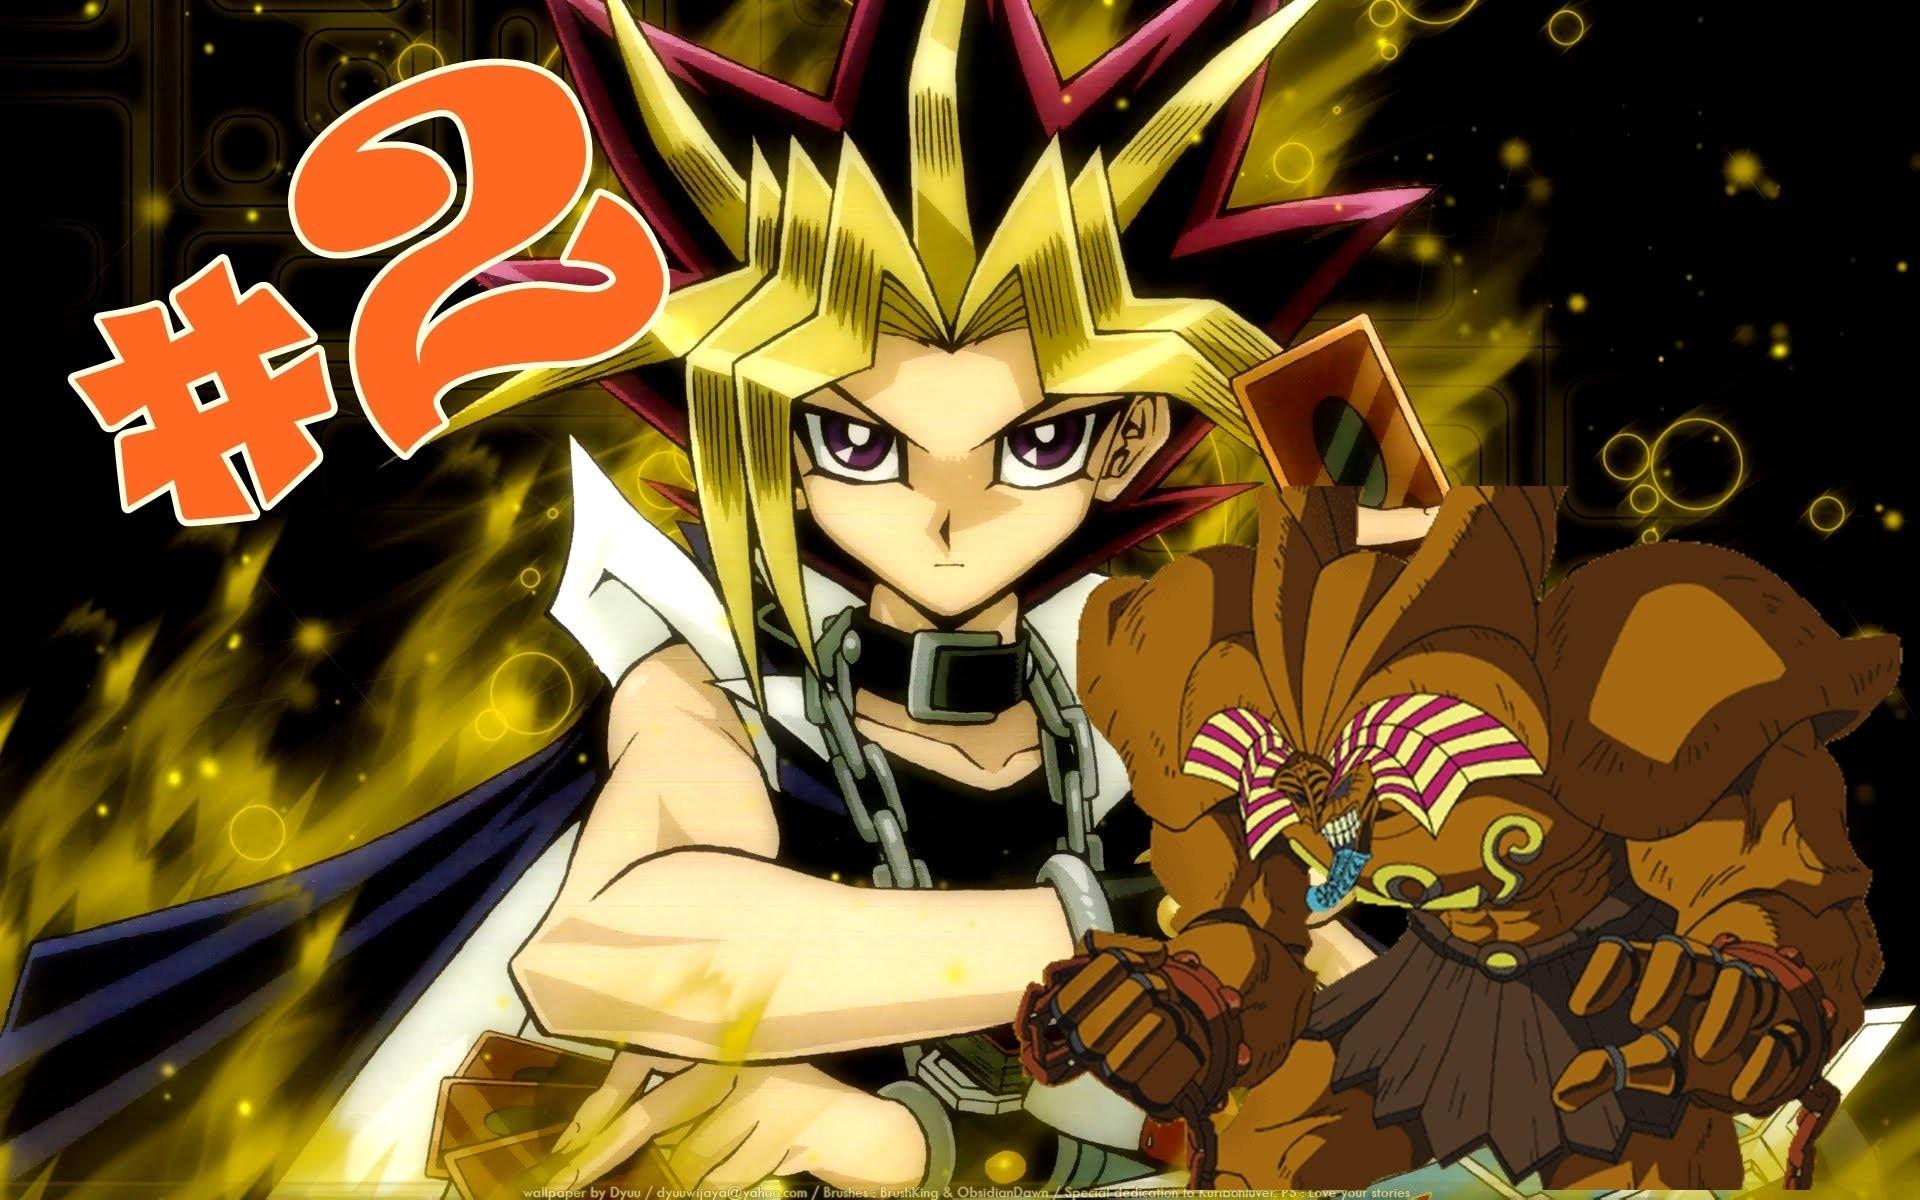 Yu-Gi-Oh! Joey the Passion [Exodia'yı Çağırıyorummm] [Bölüm 2]